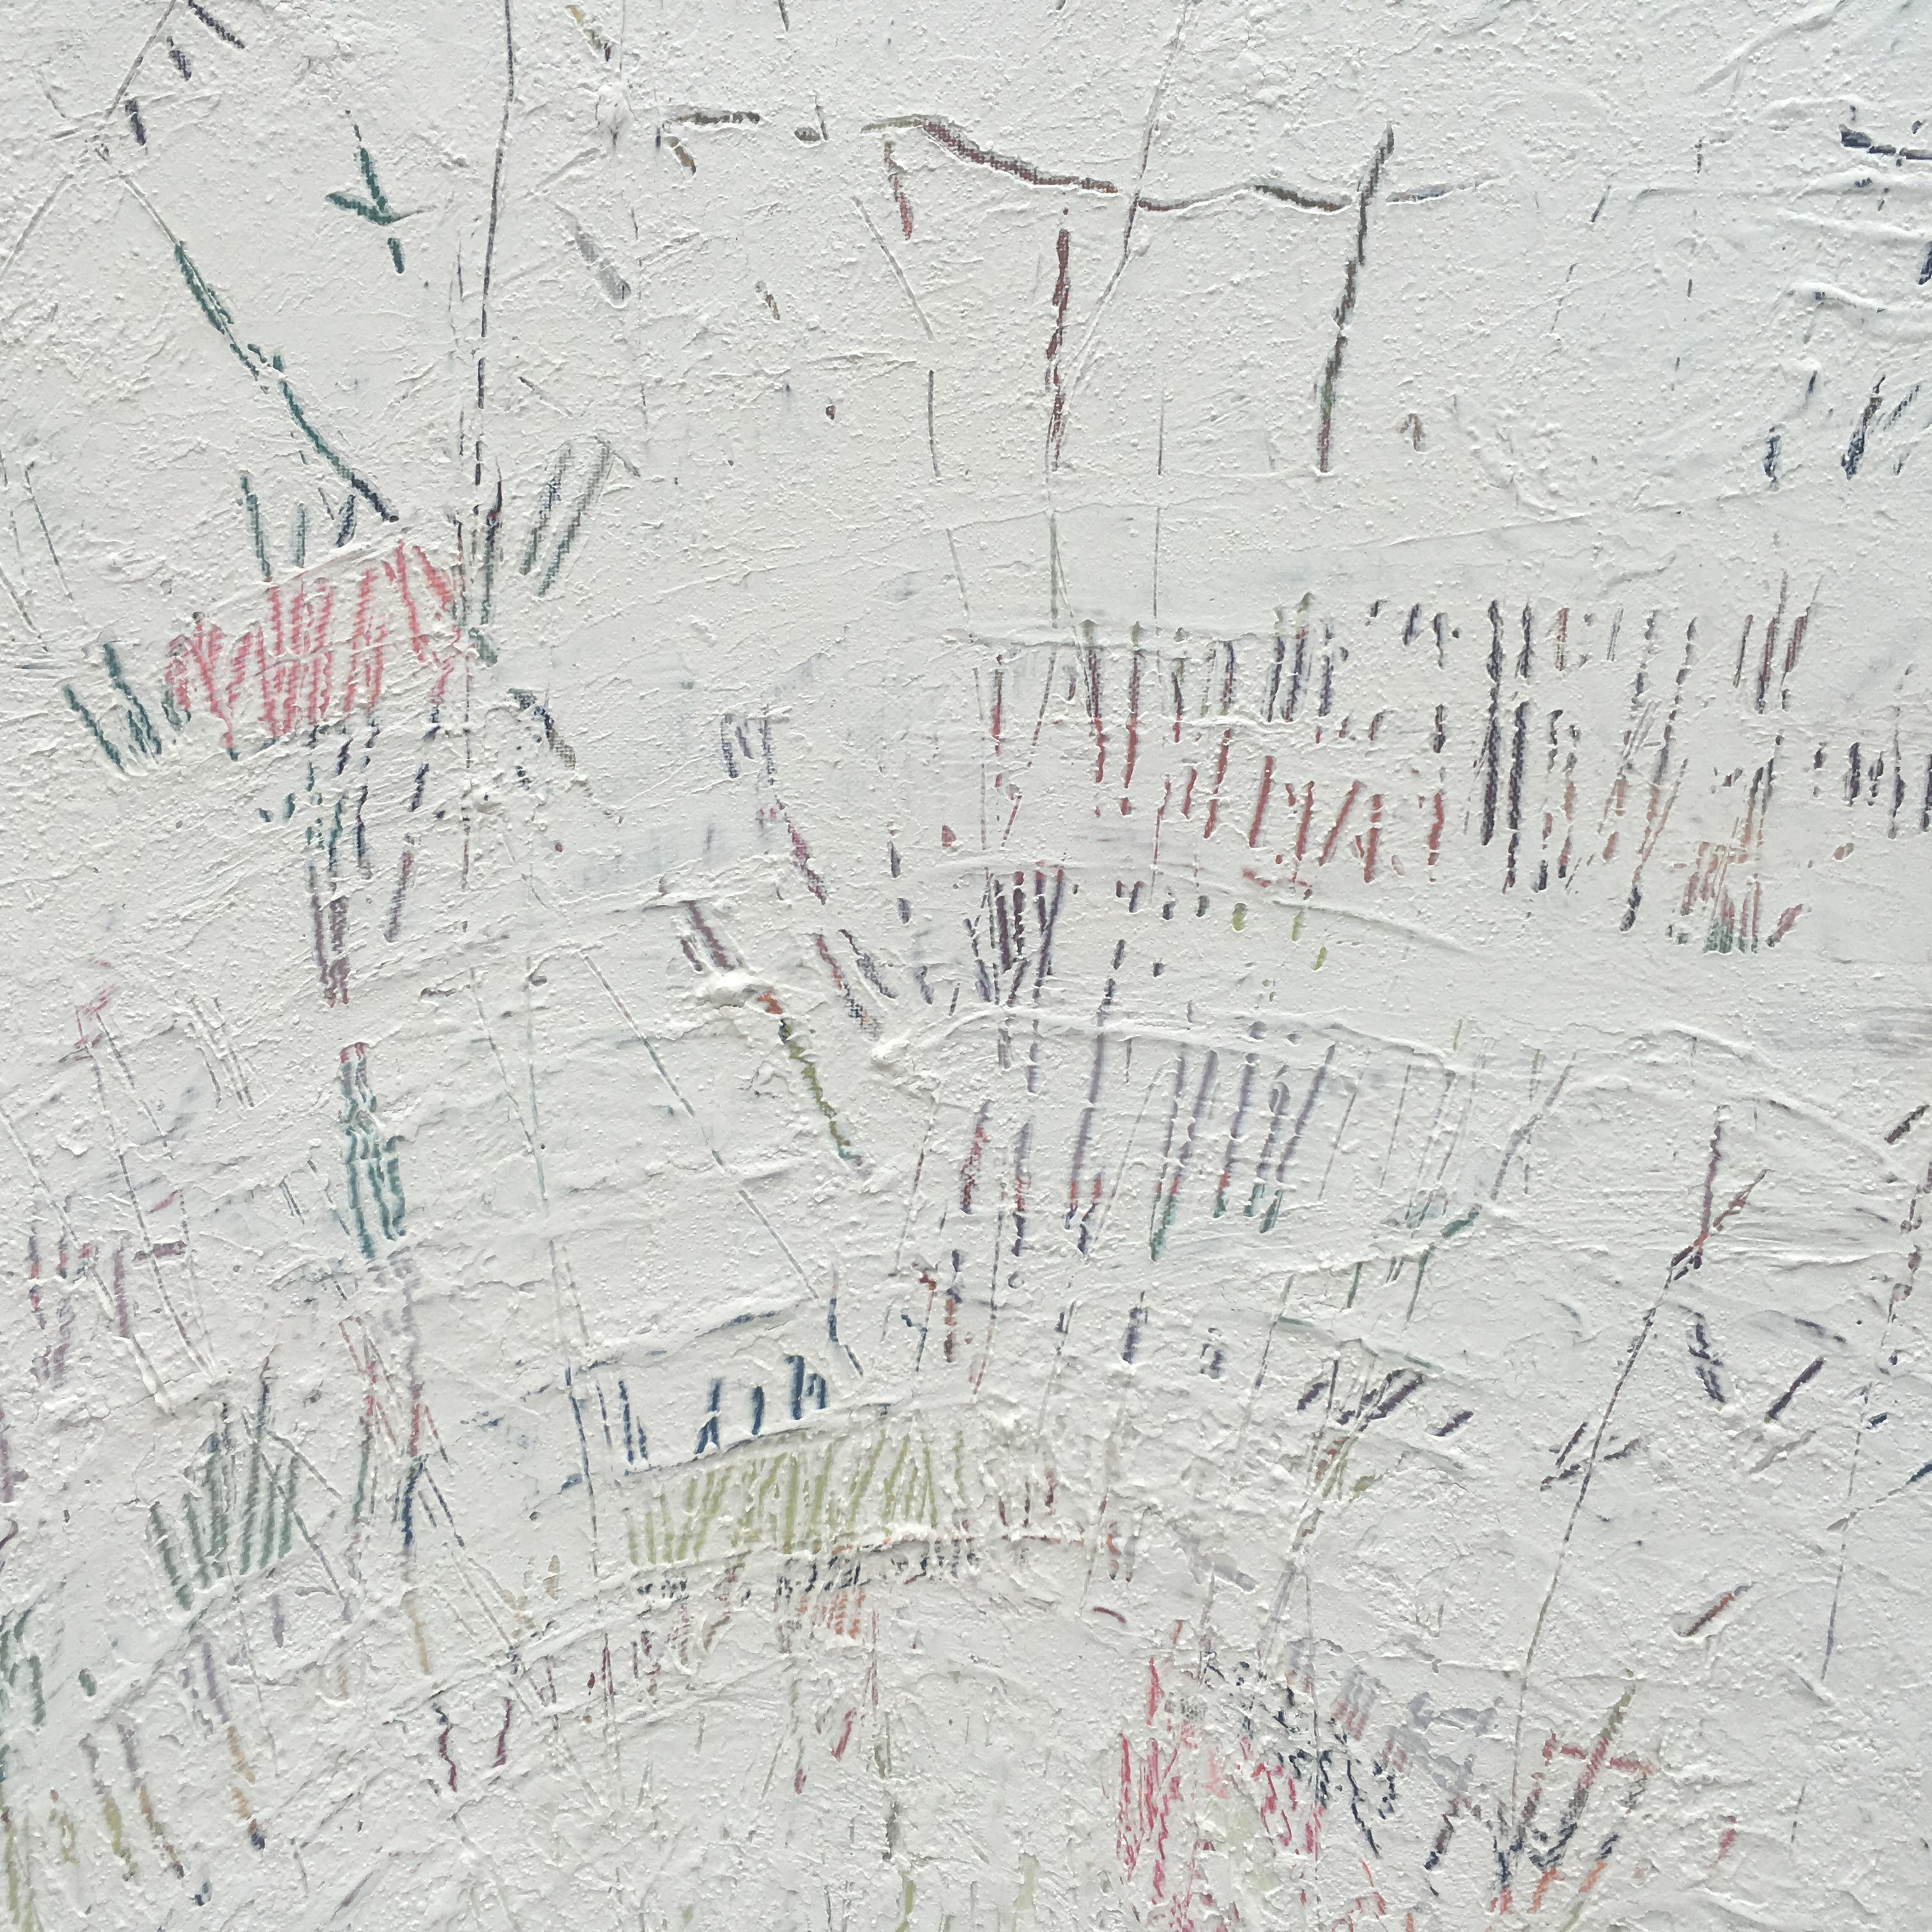 Panta Rhei III, detail 1